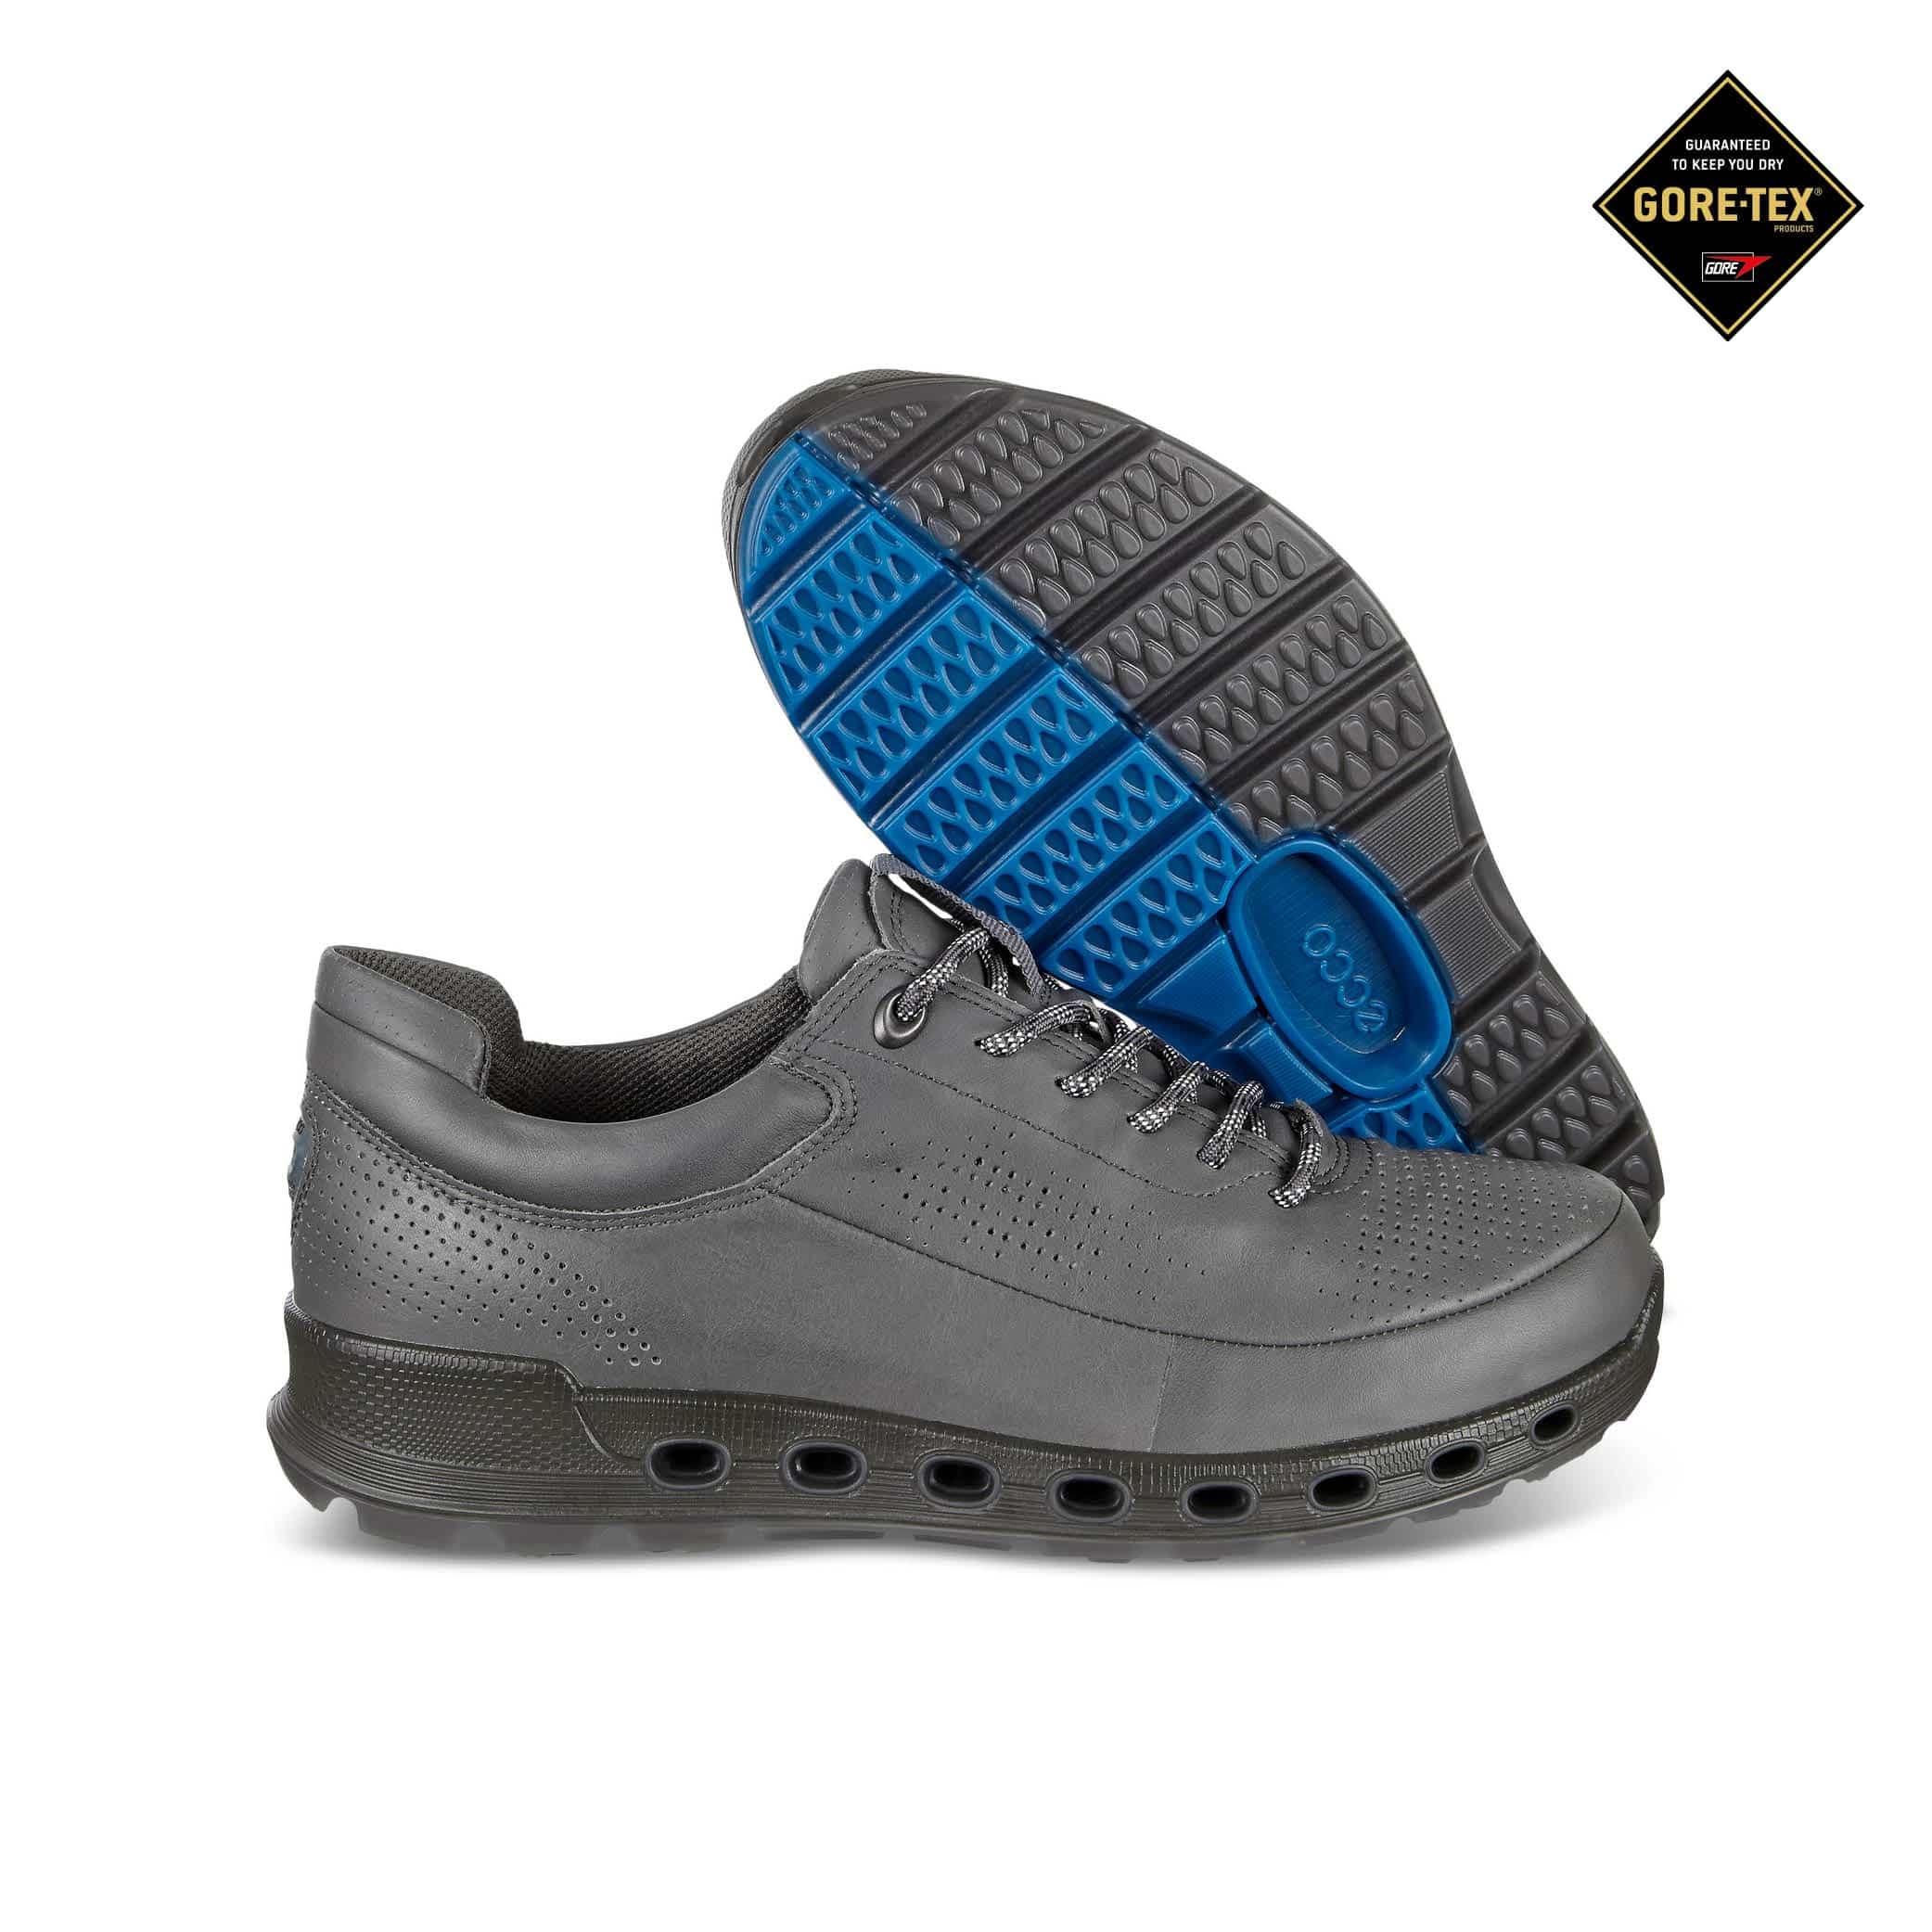 ECCO COOL 2.0 - ECCO Shoes for Men